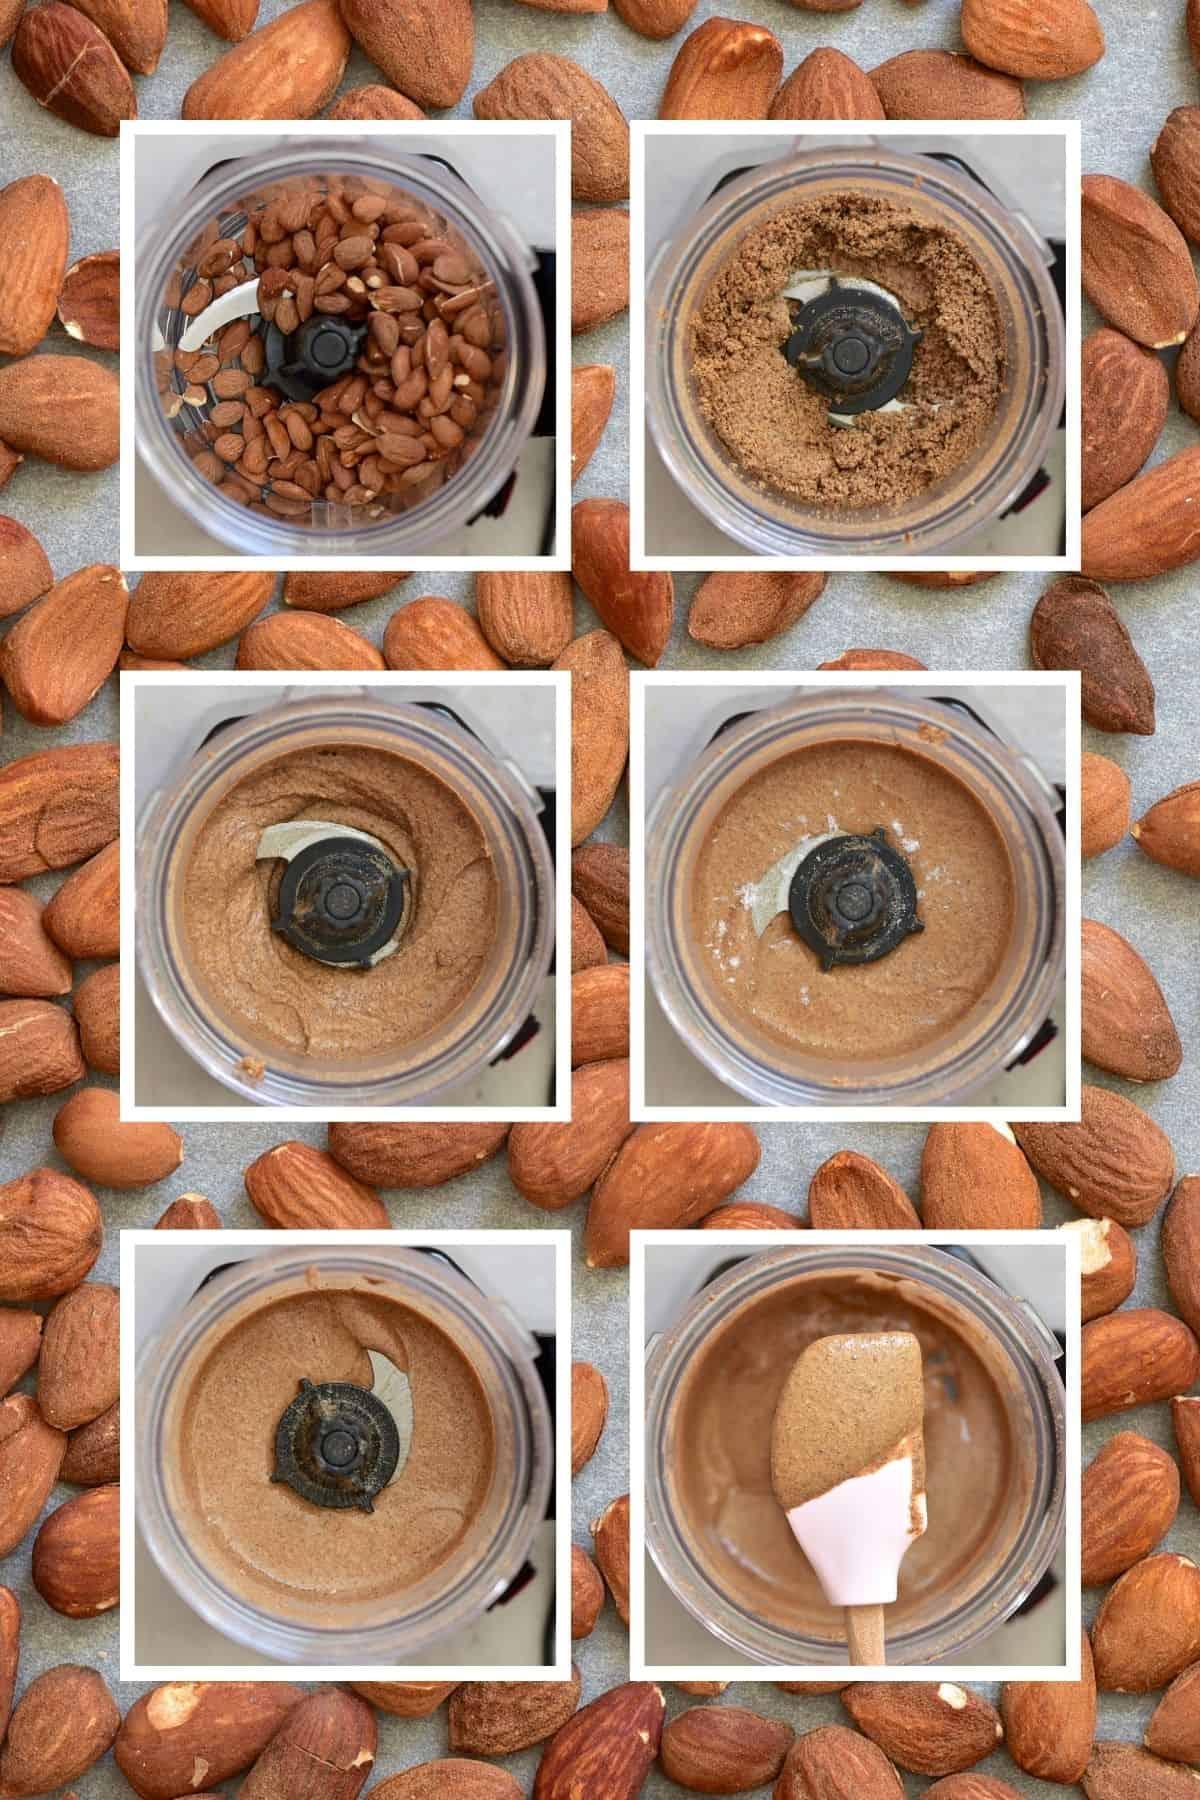 Steps for makinig almond butter